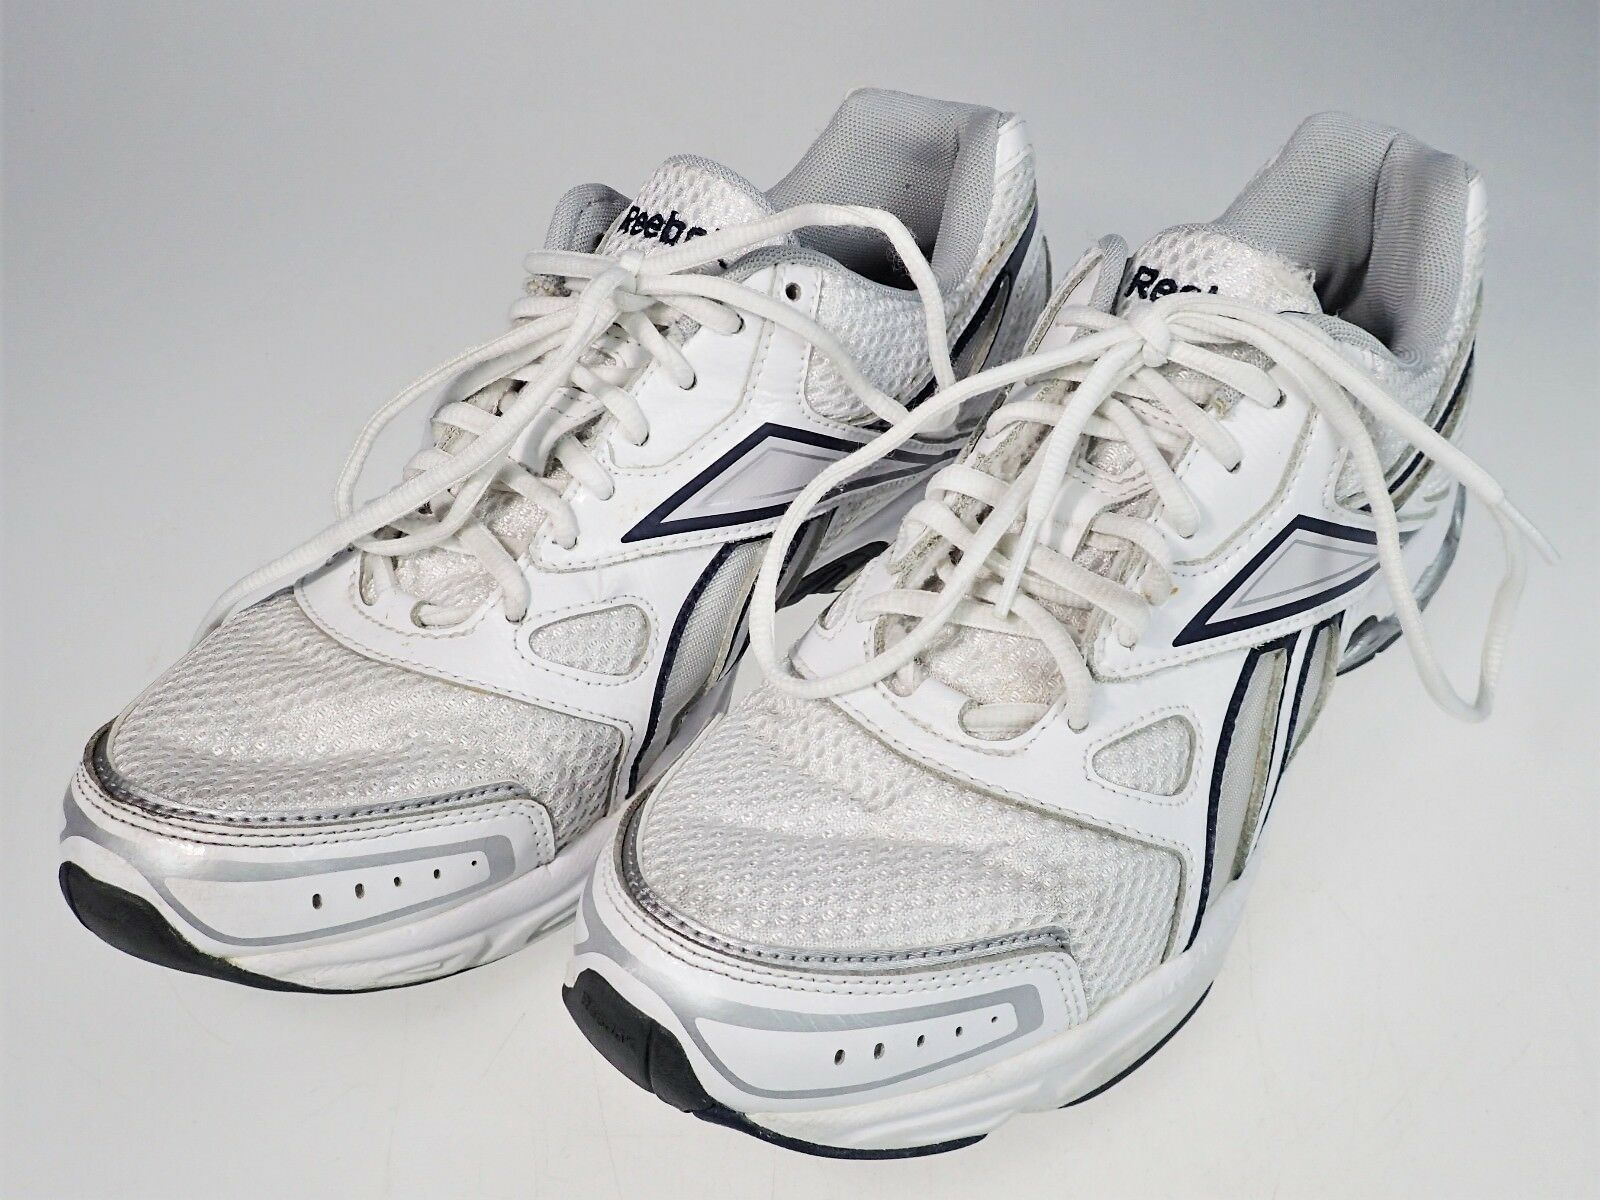 Mens 9.5 Reebok DMX Trainer Sneaker Athletic Shoes Kicks